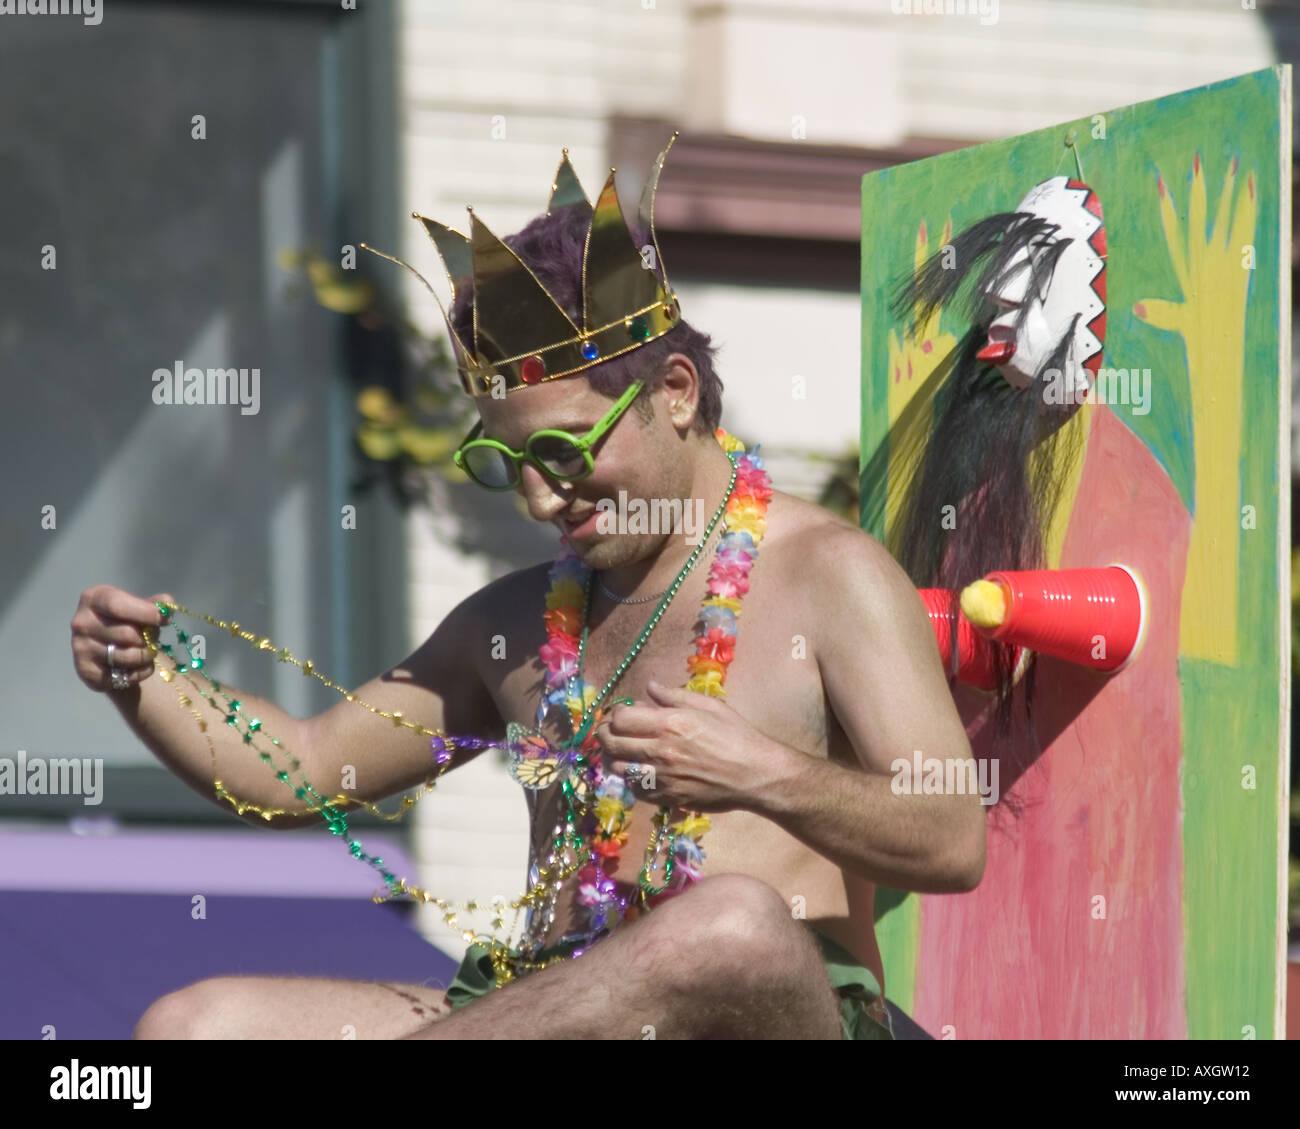 Dieser Teilnehmer Doo Dah Parade 2005 verspottet auch die Karneval parade Stockfoto